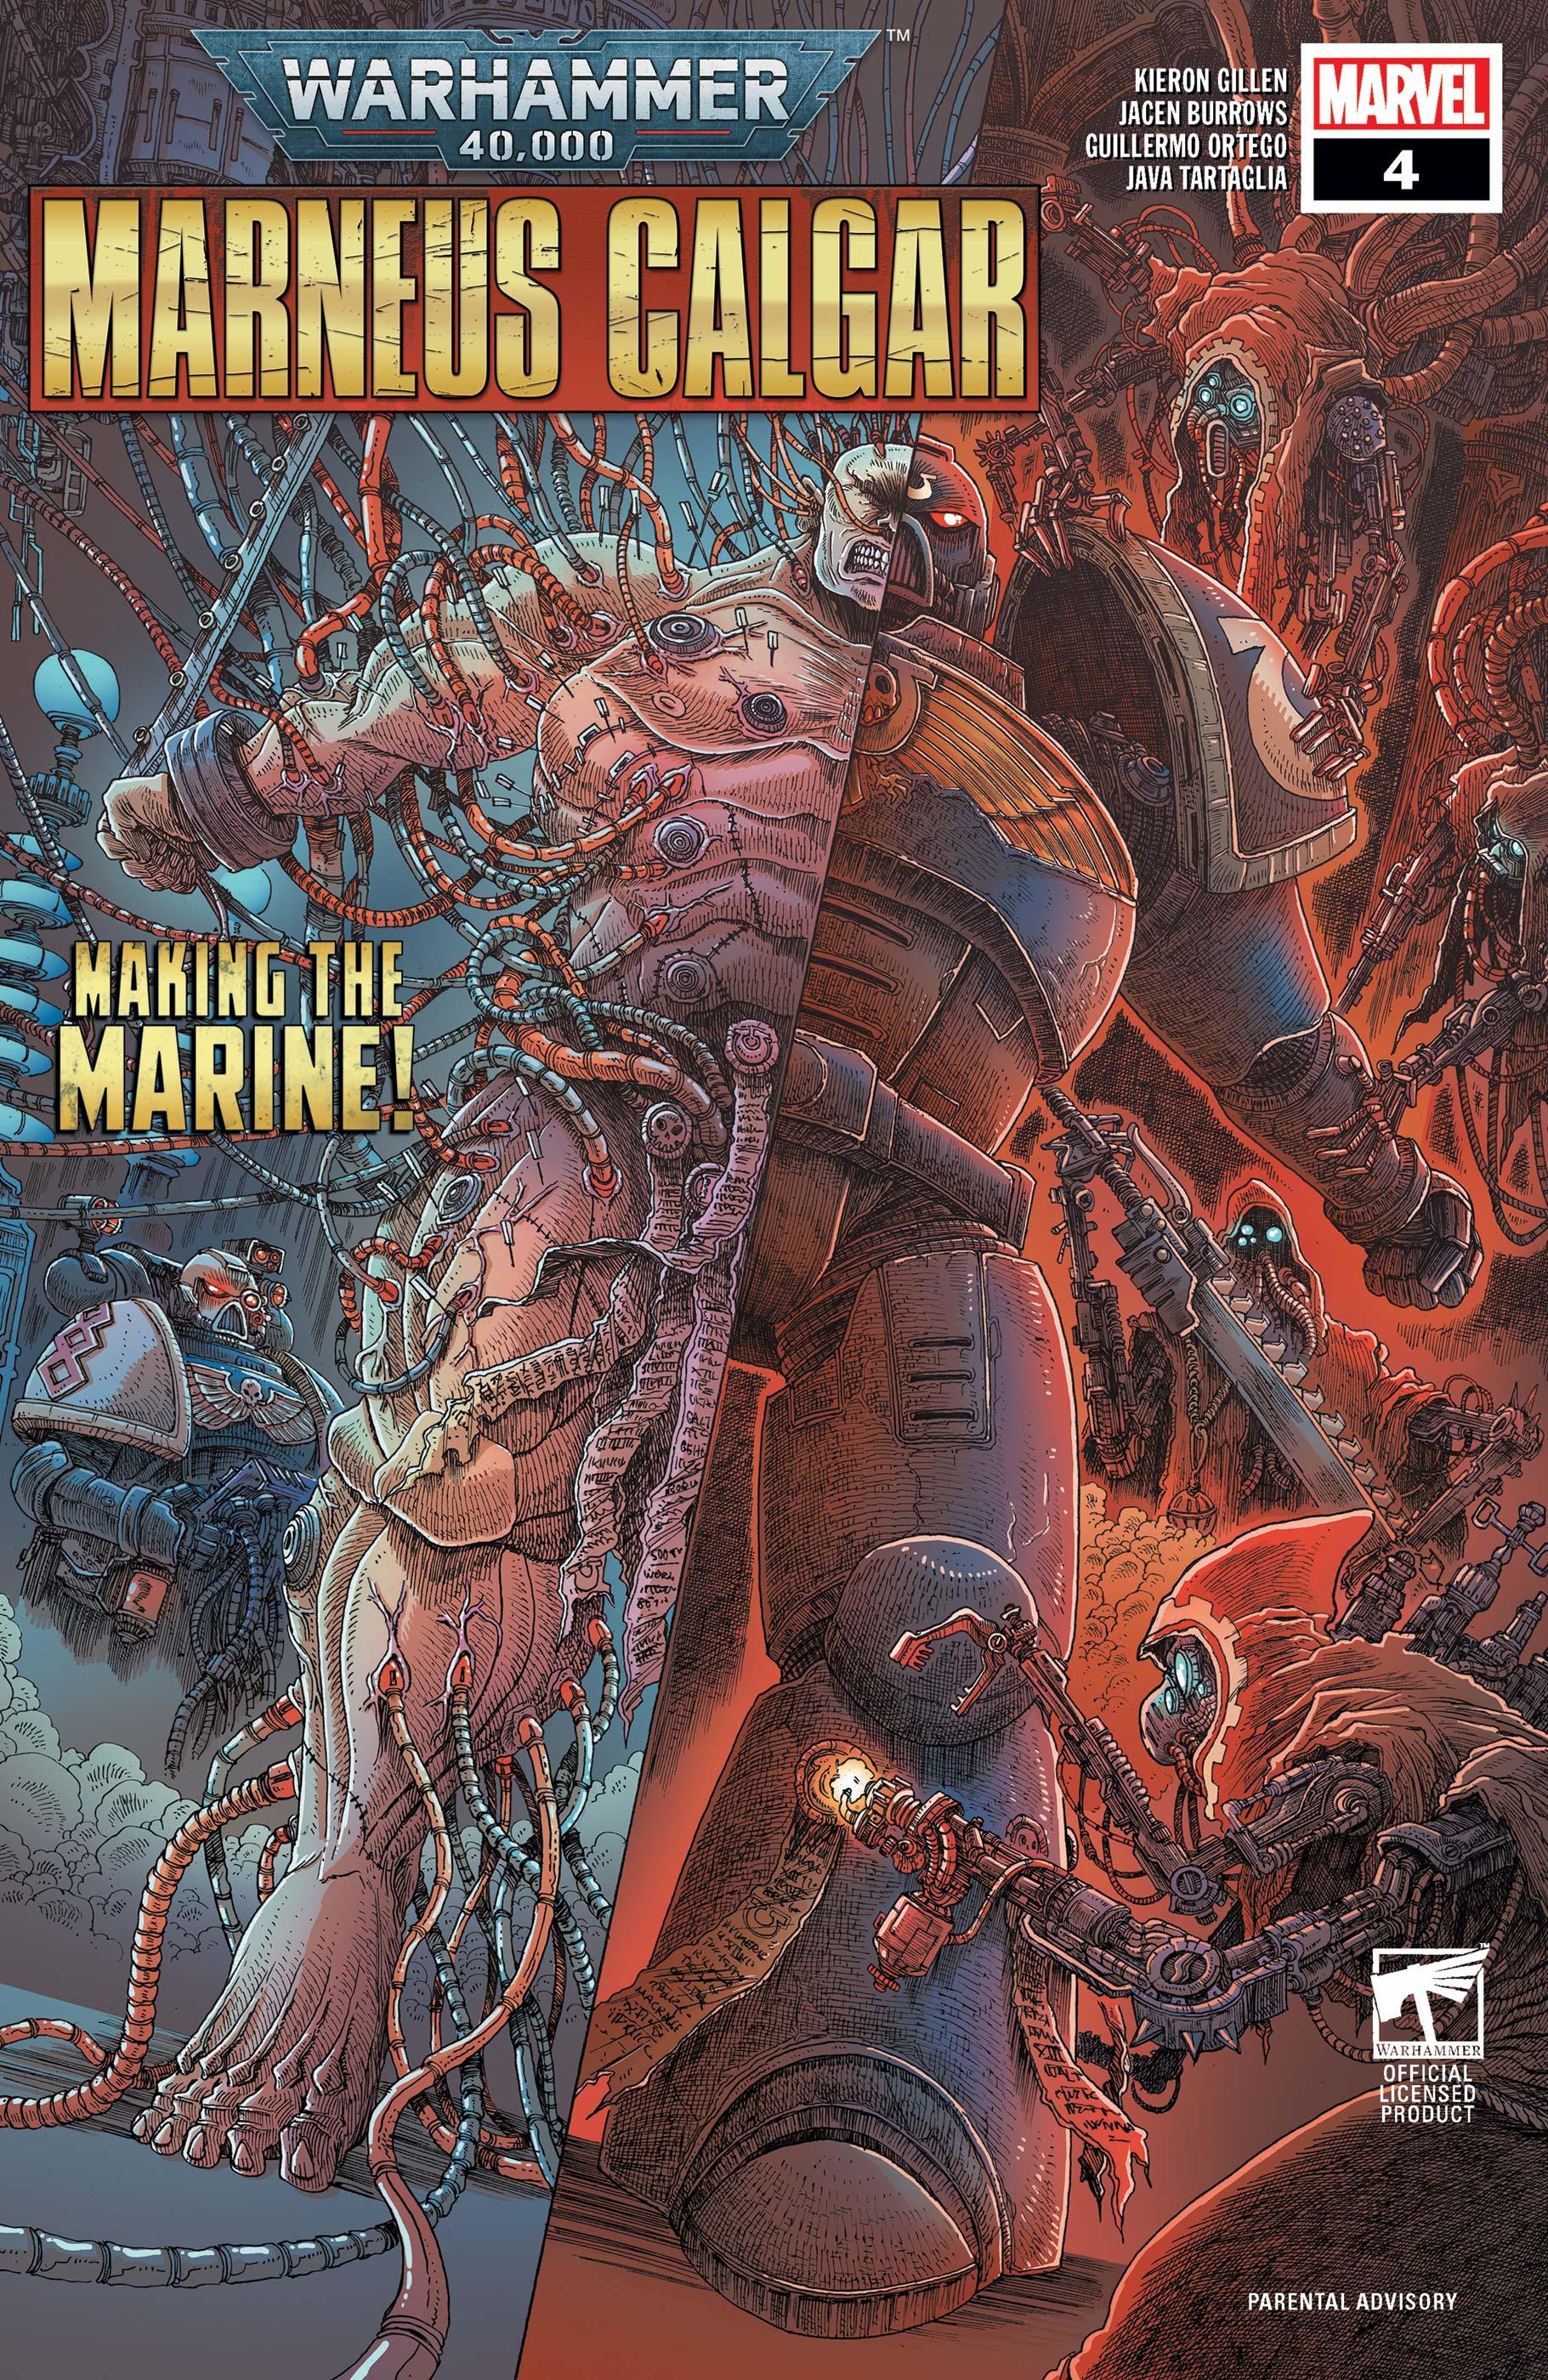 Warhammer 40,000: Marneus Calgar (2020) #4